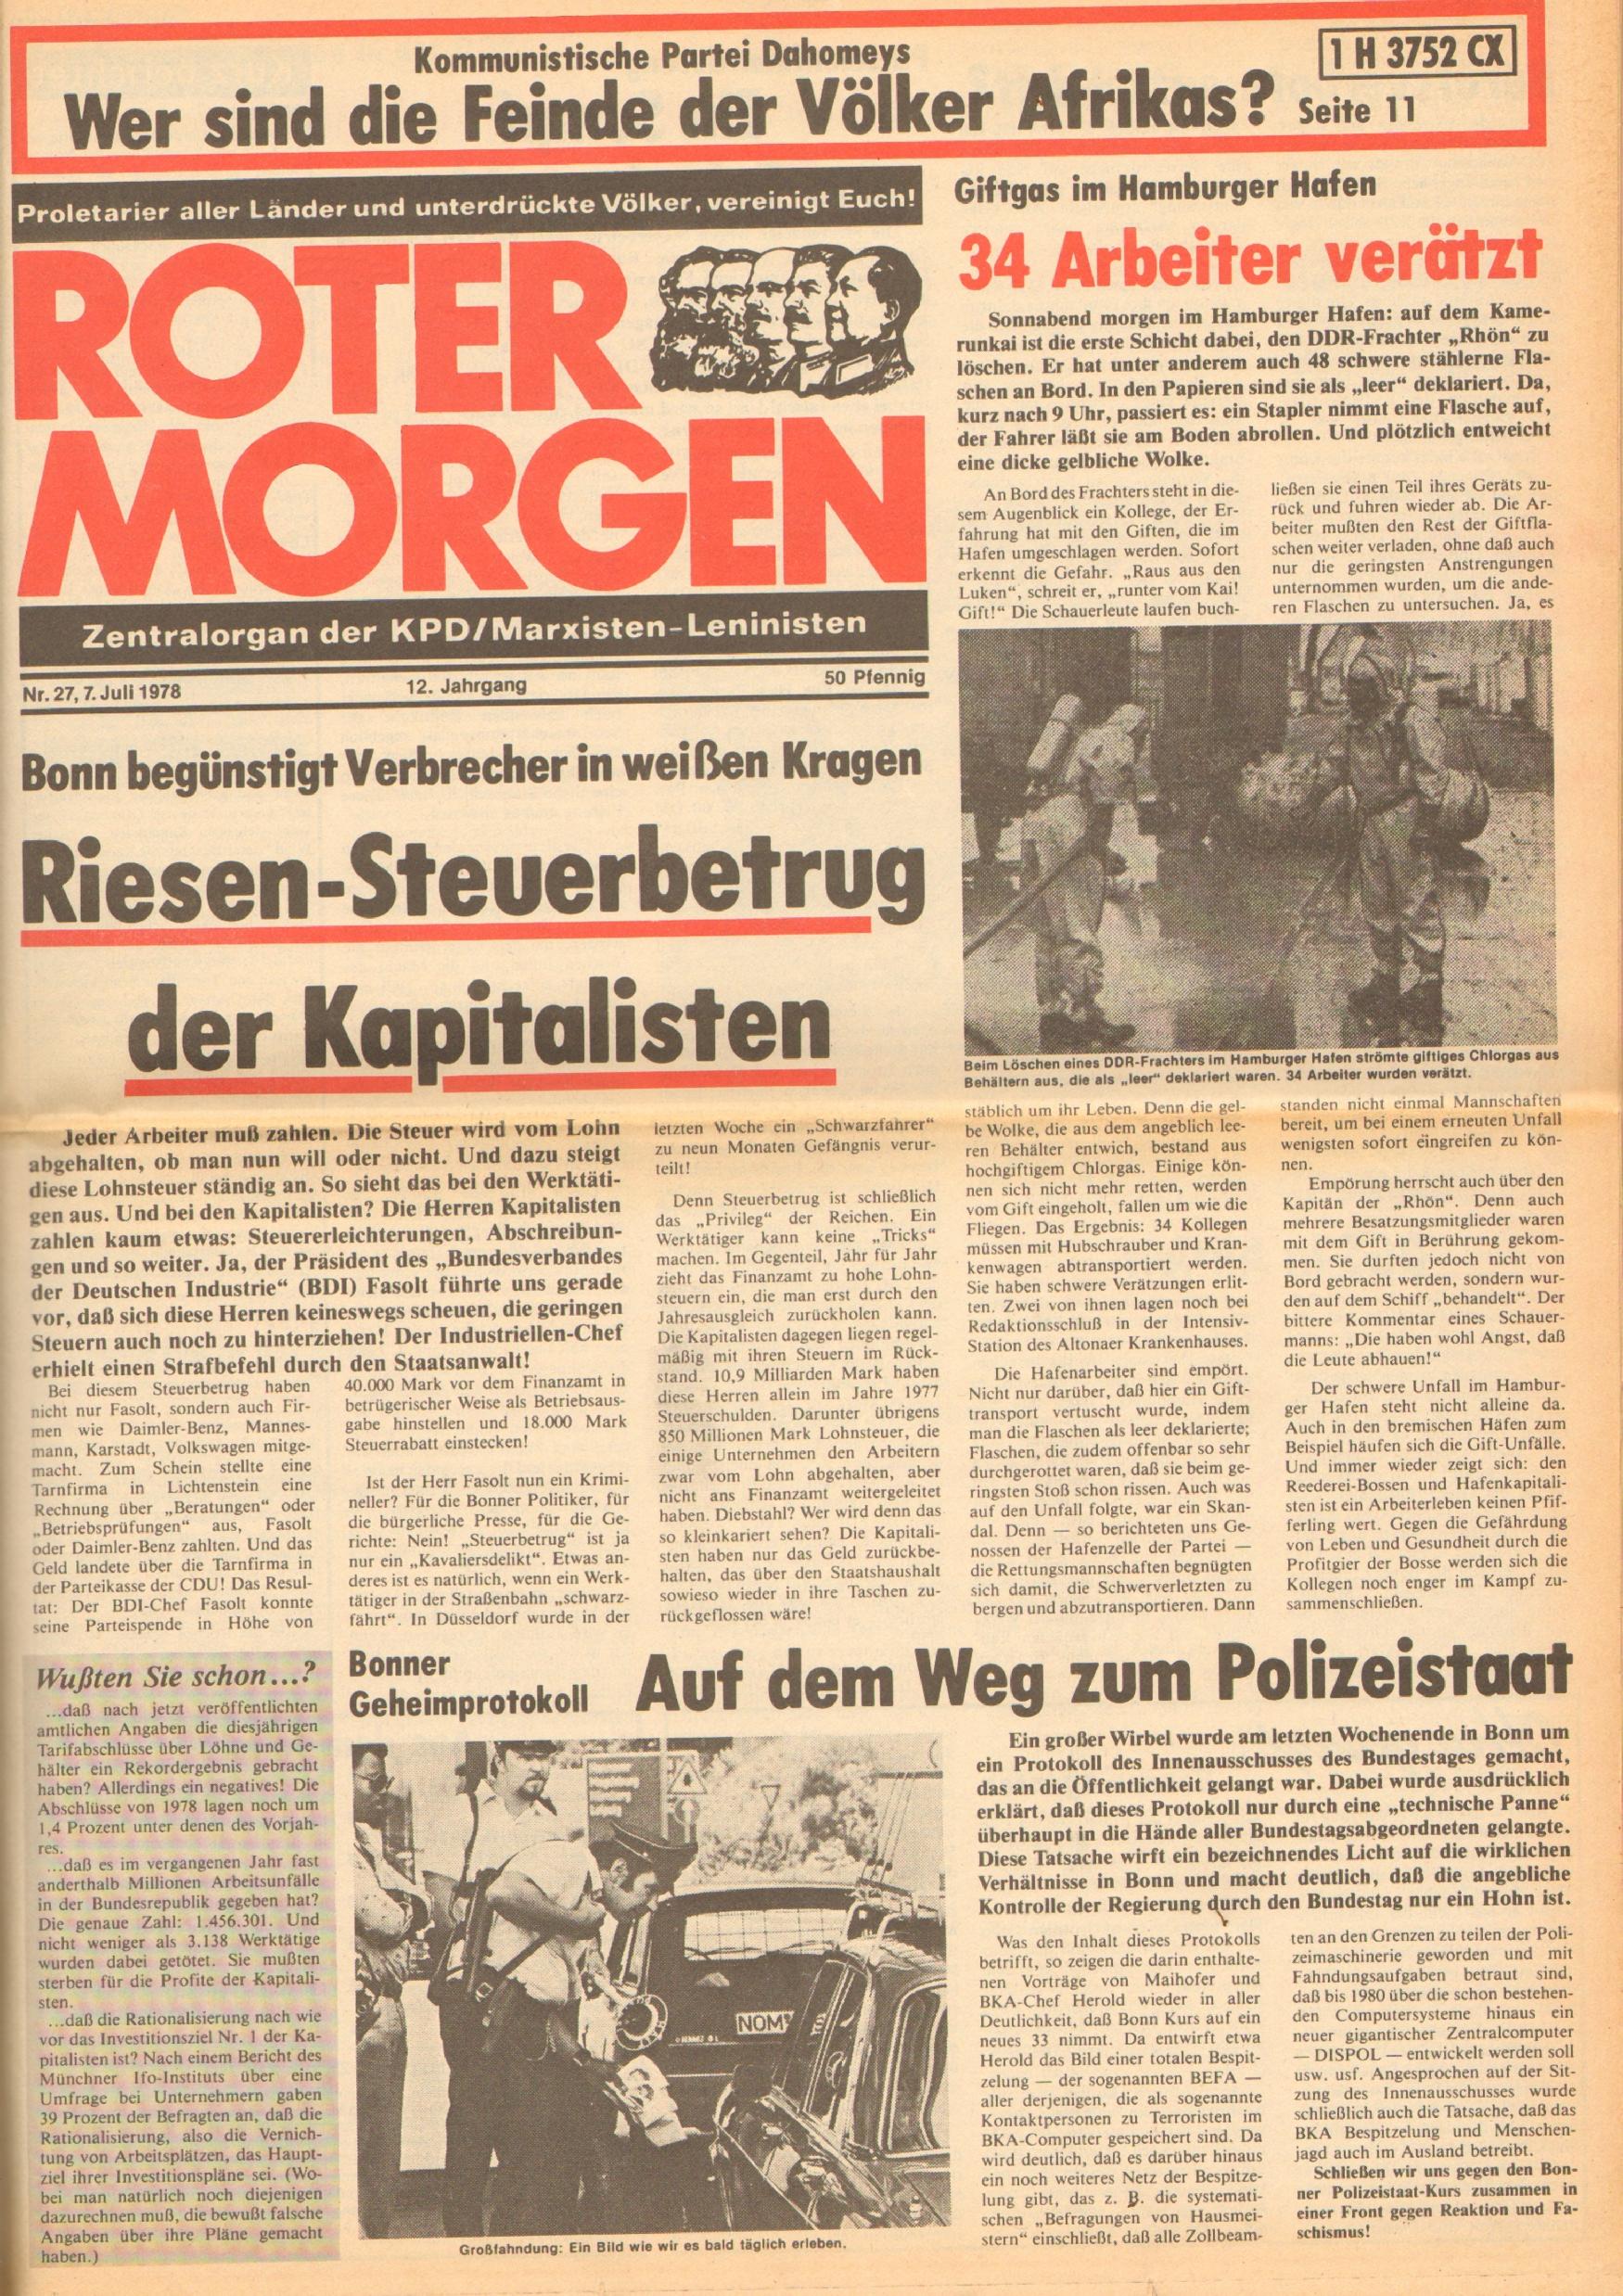 Roter Morgen, 12. Jg., 7. Juli 1978, Nr. 27, Seite 1